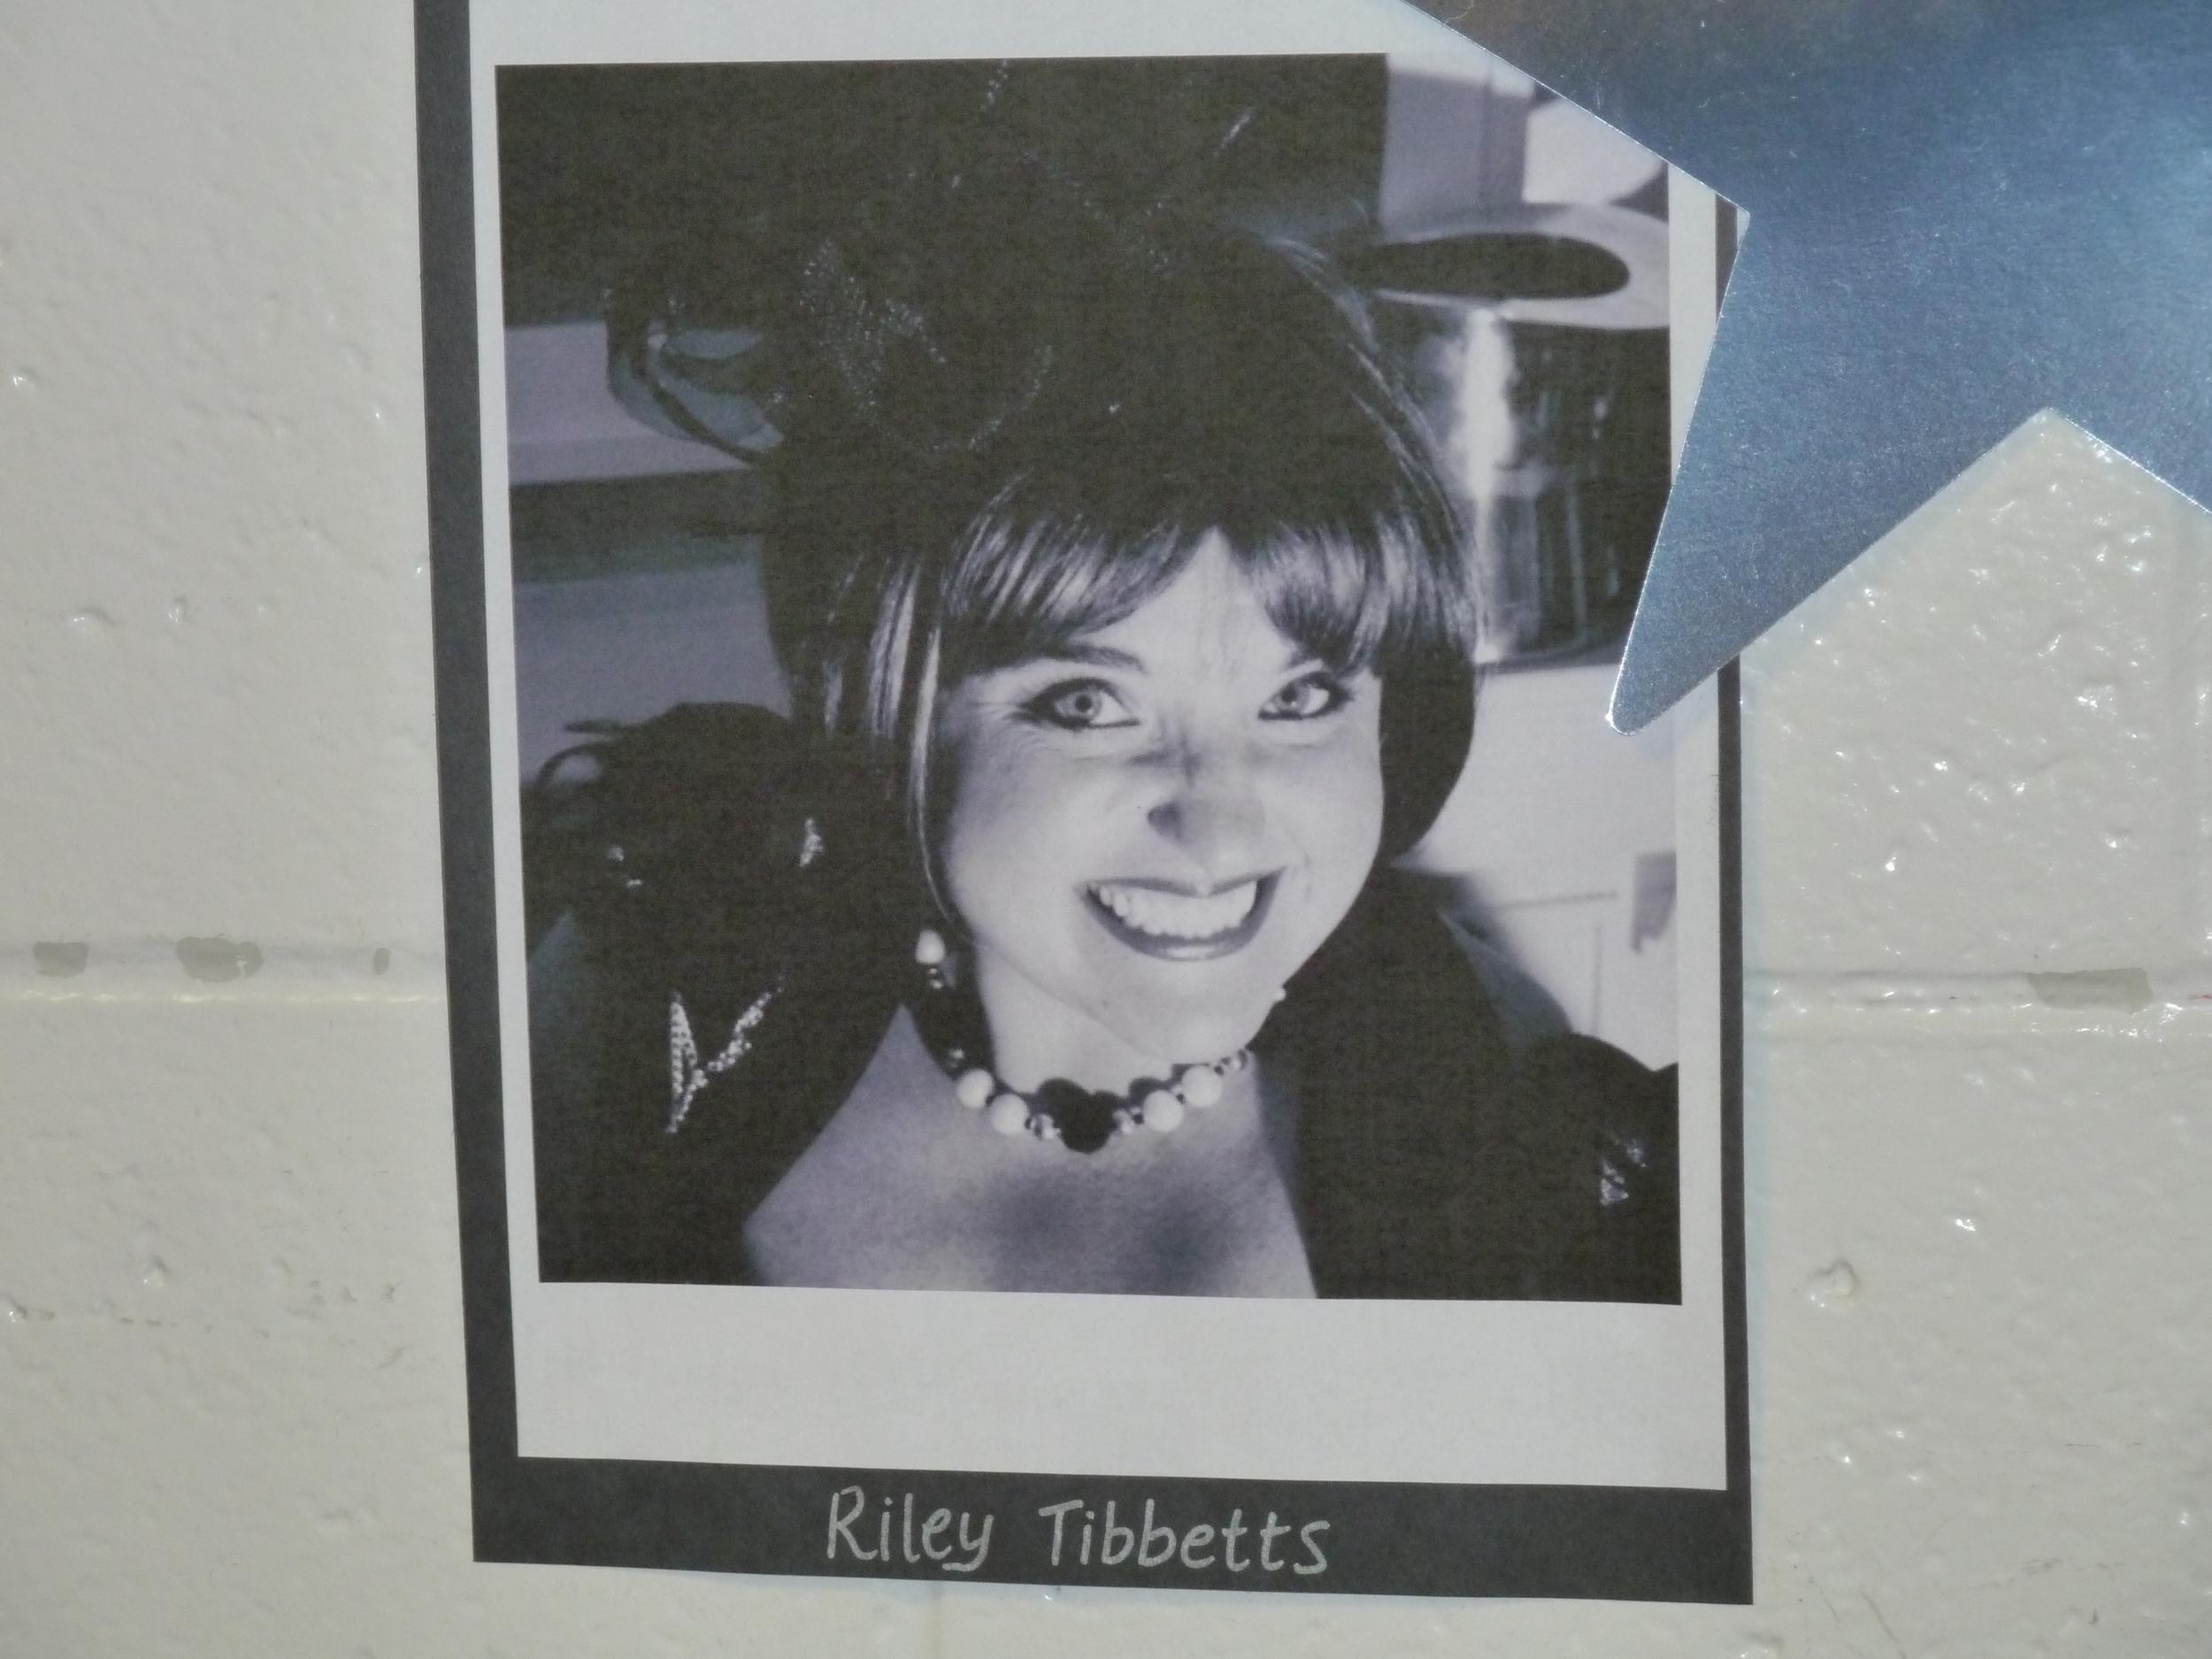 Riley Tibbetts